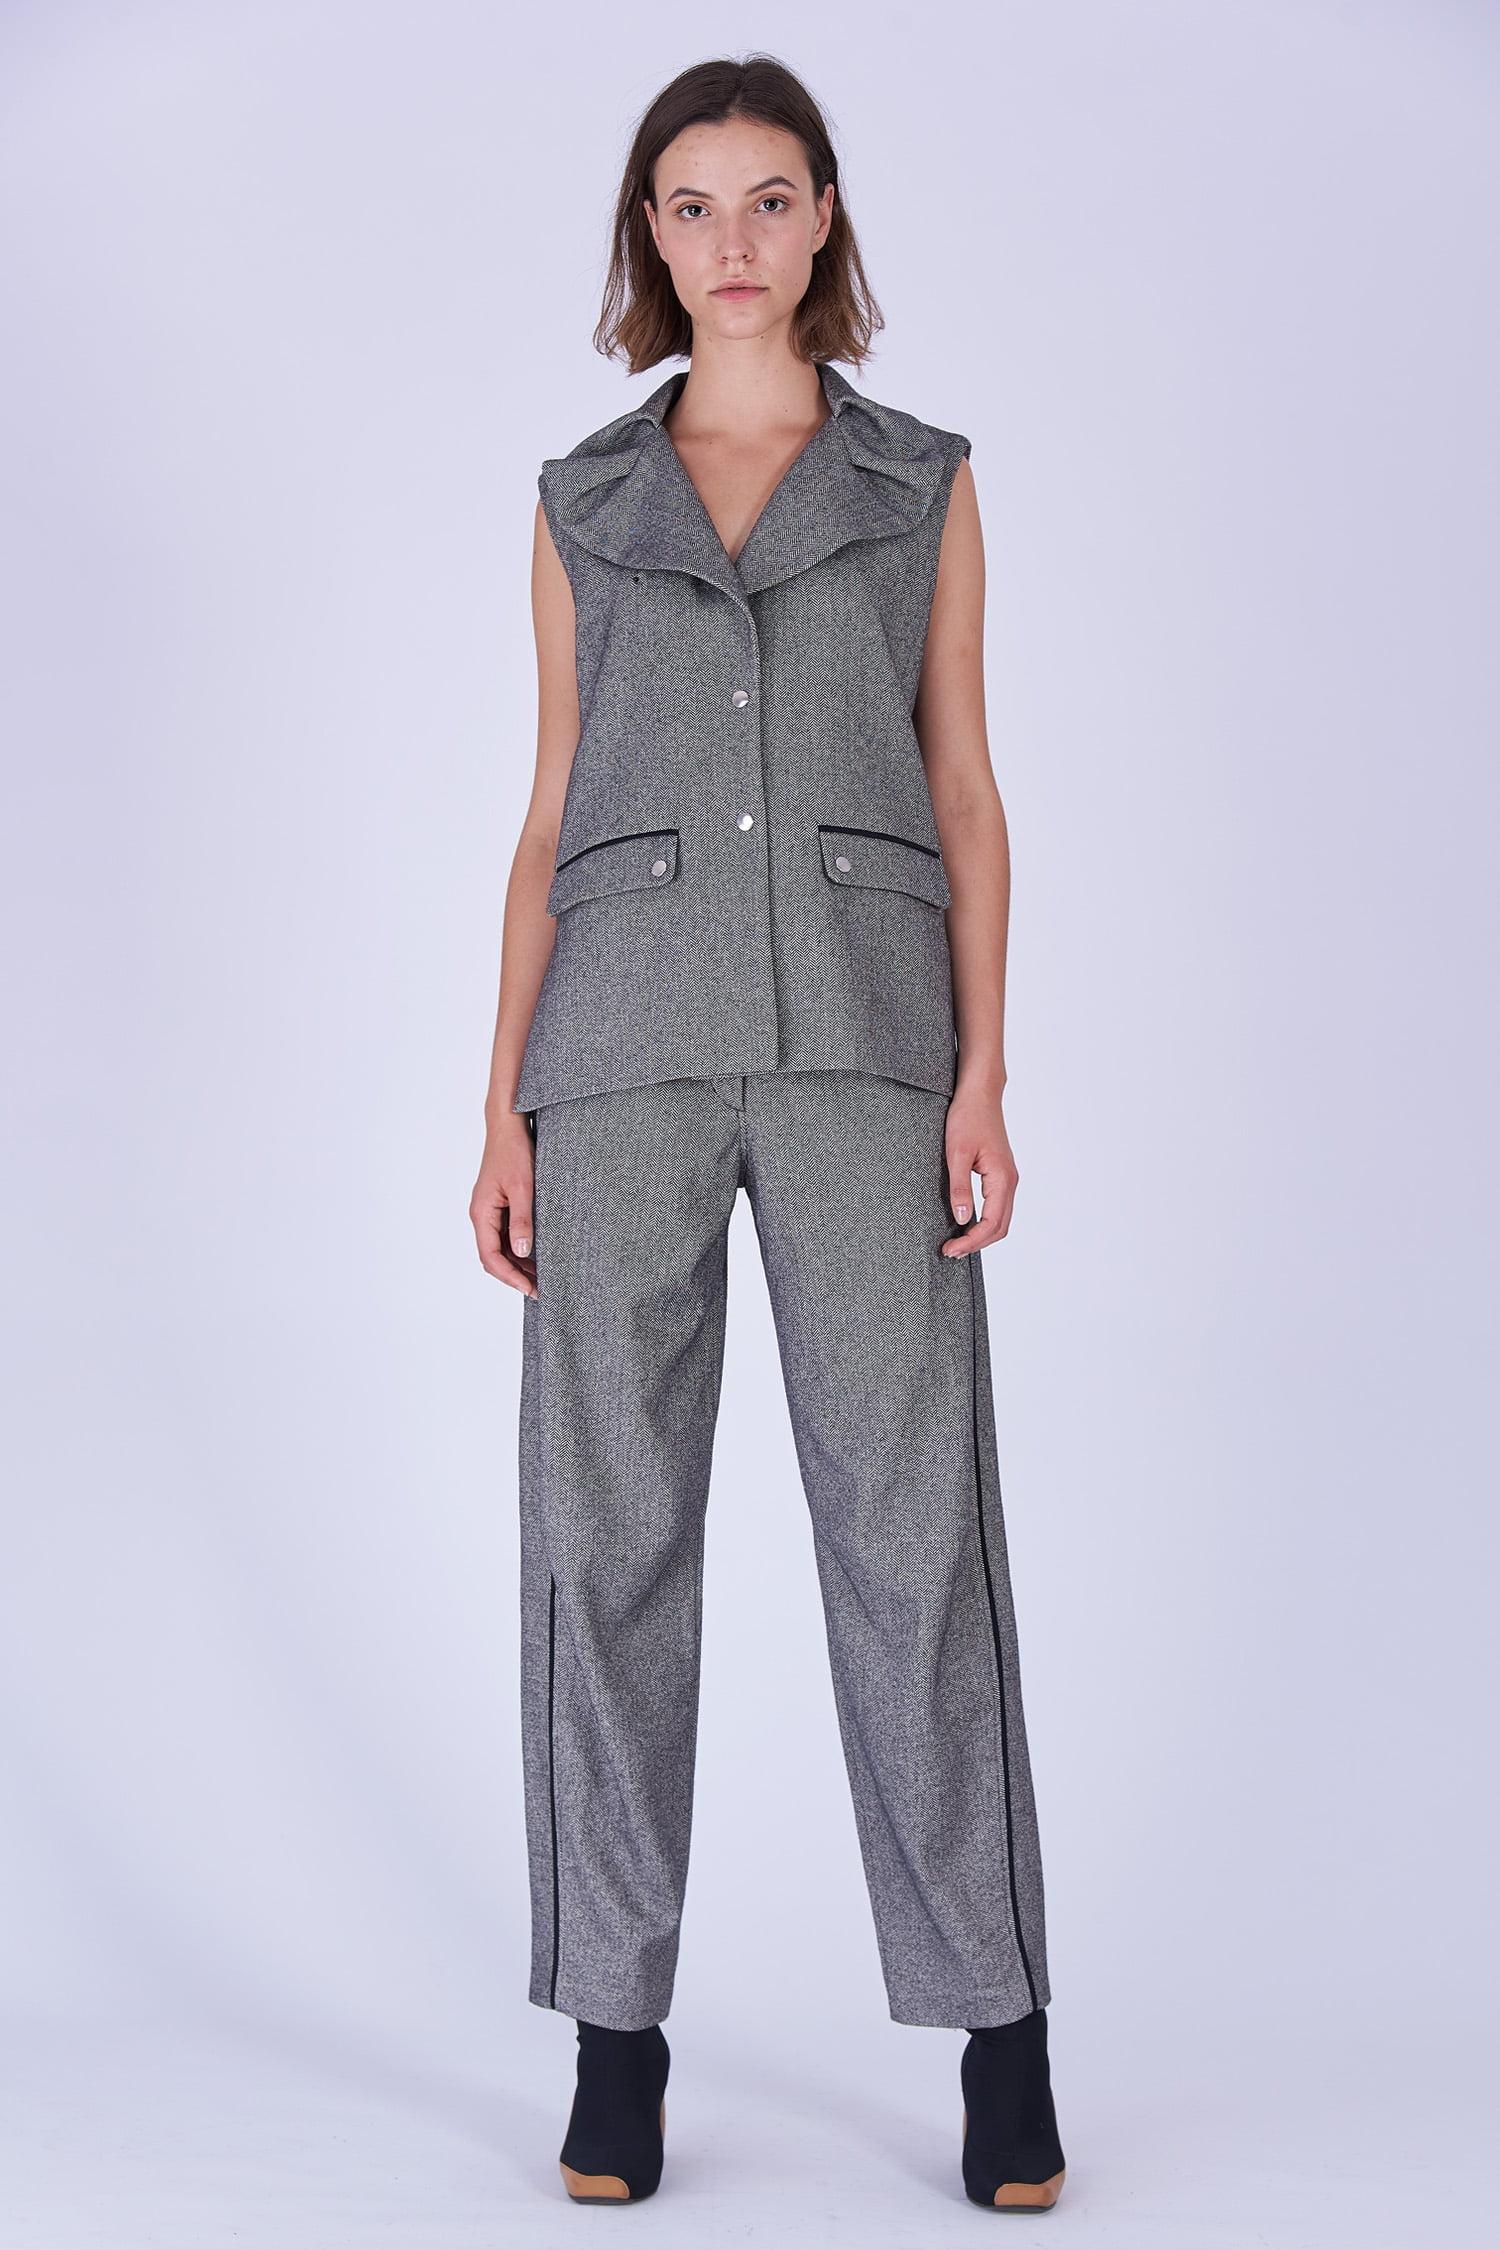 Acephala Fw19 20 Grey Herringbone Wool Sleeveless Jacket Trousers Marynarka Szara Jodelka Welna Spodnie Front 2